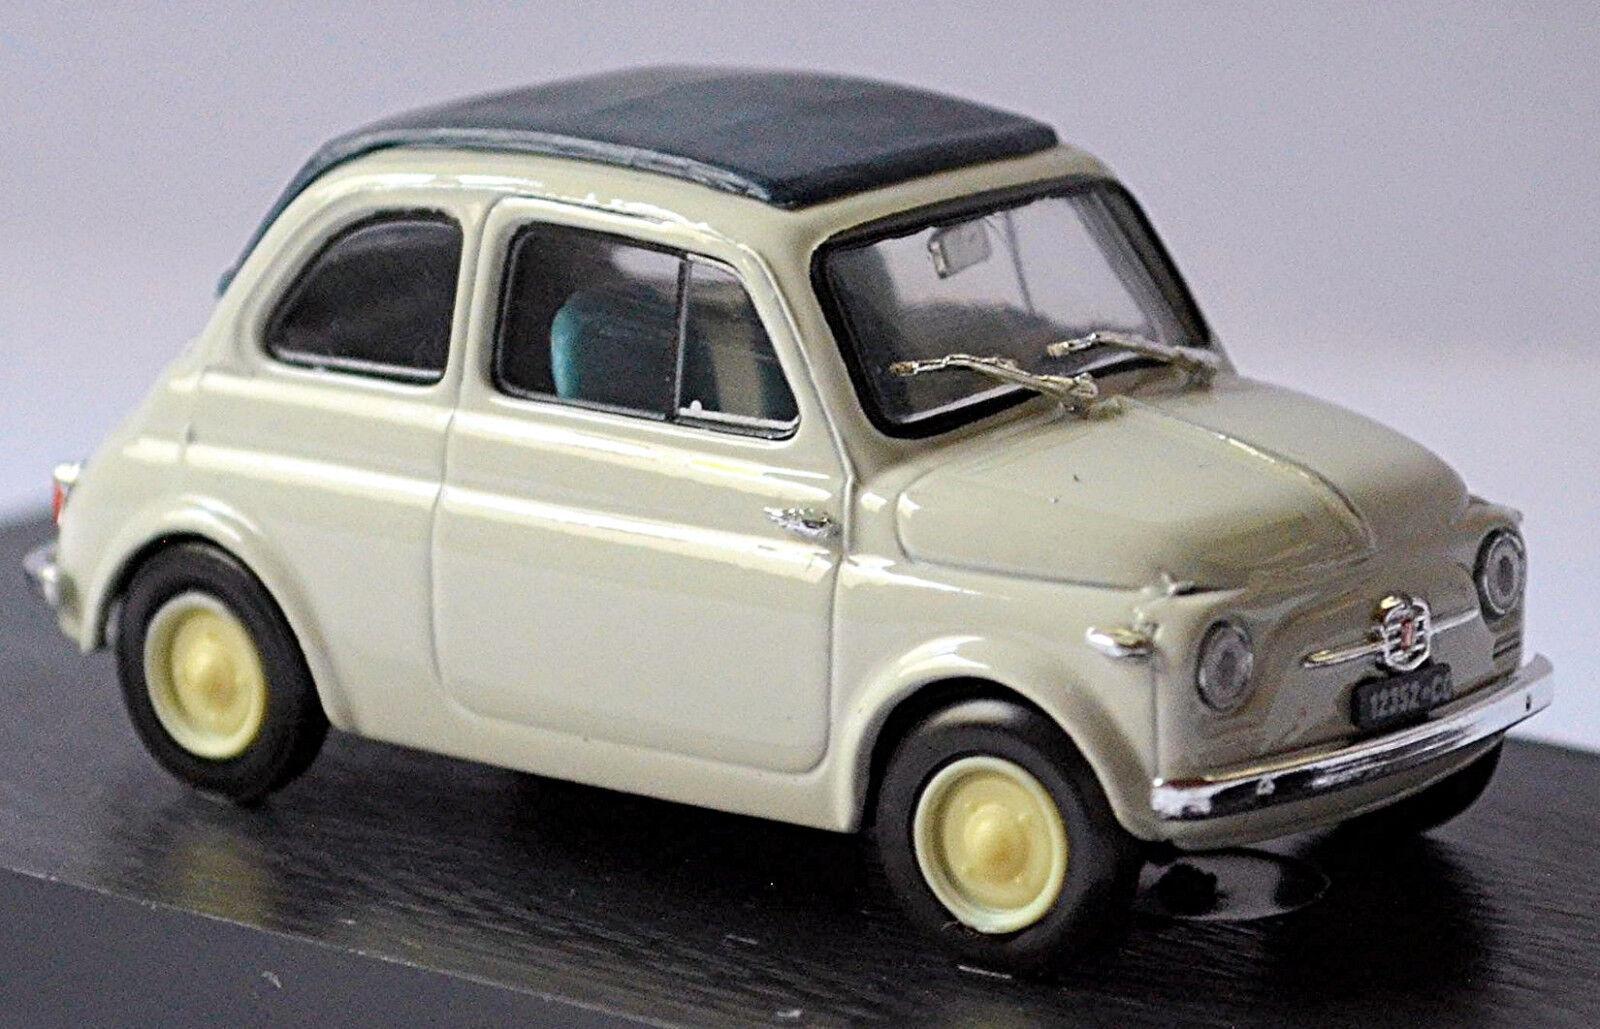 Fiat Nuova 500 Canopy Cerrado 1957 gris Claro gris 1 43 Brumm